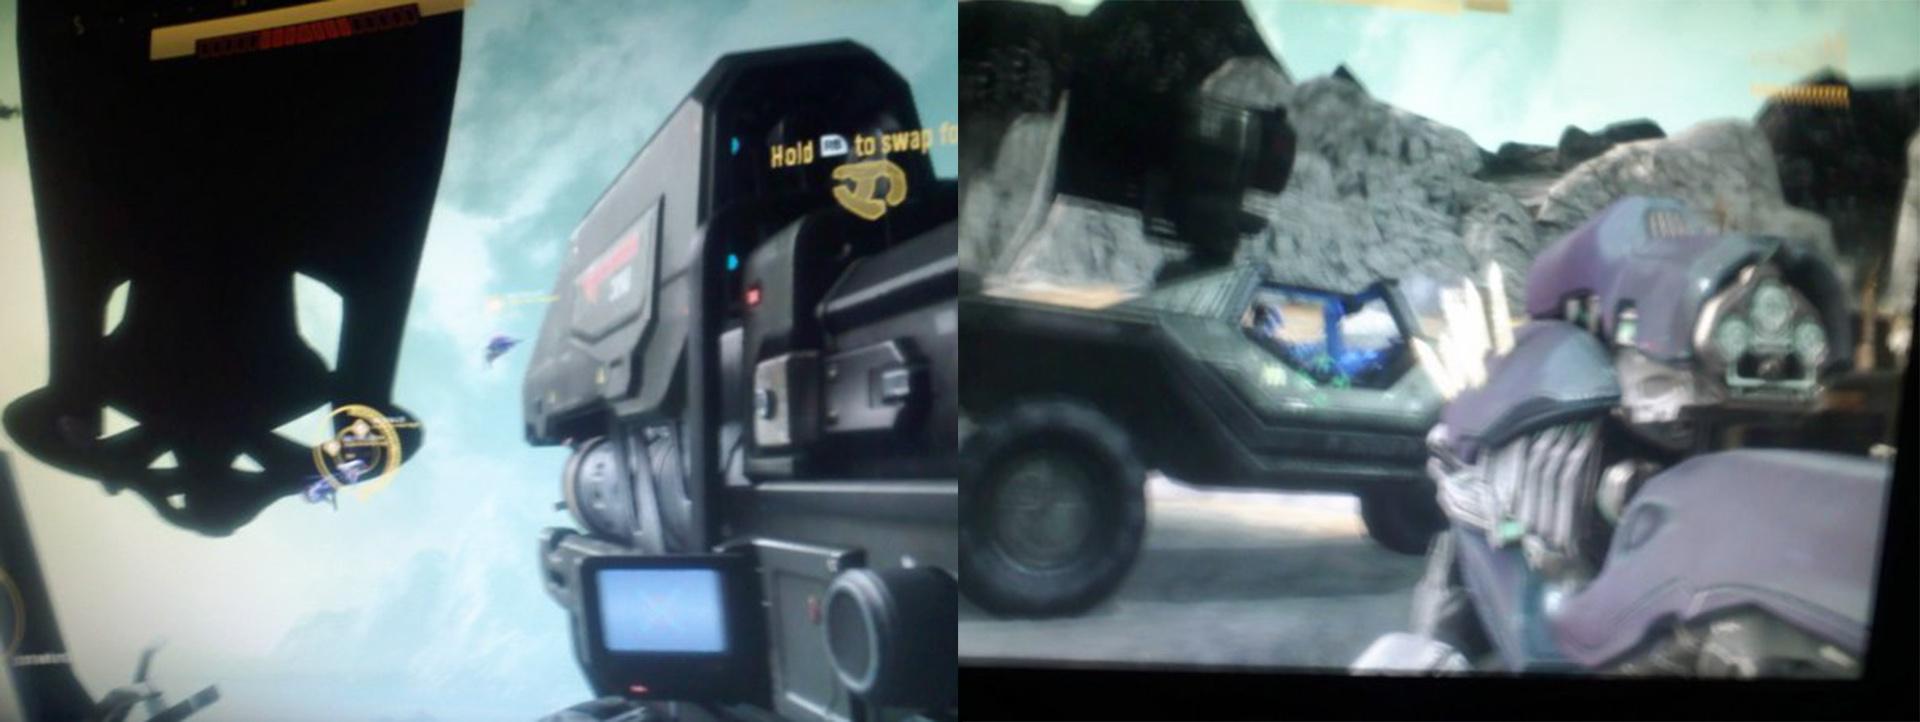 call-of-duty-modern-warfare-remastered-halo-reach